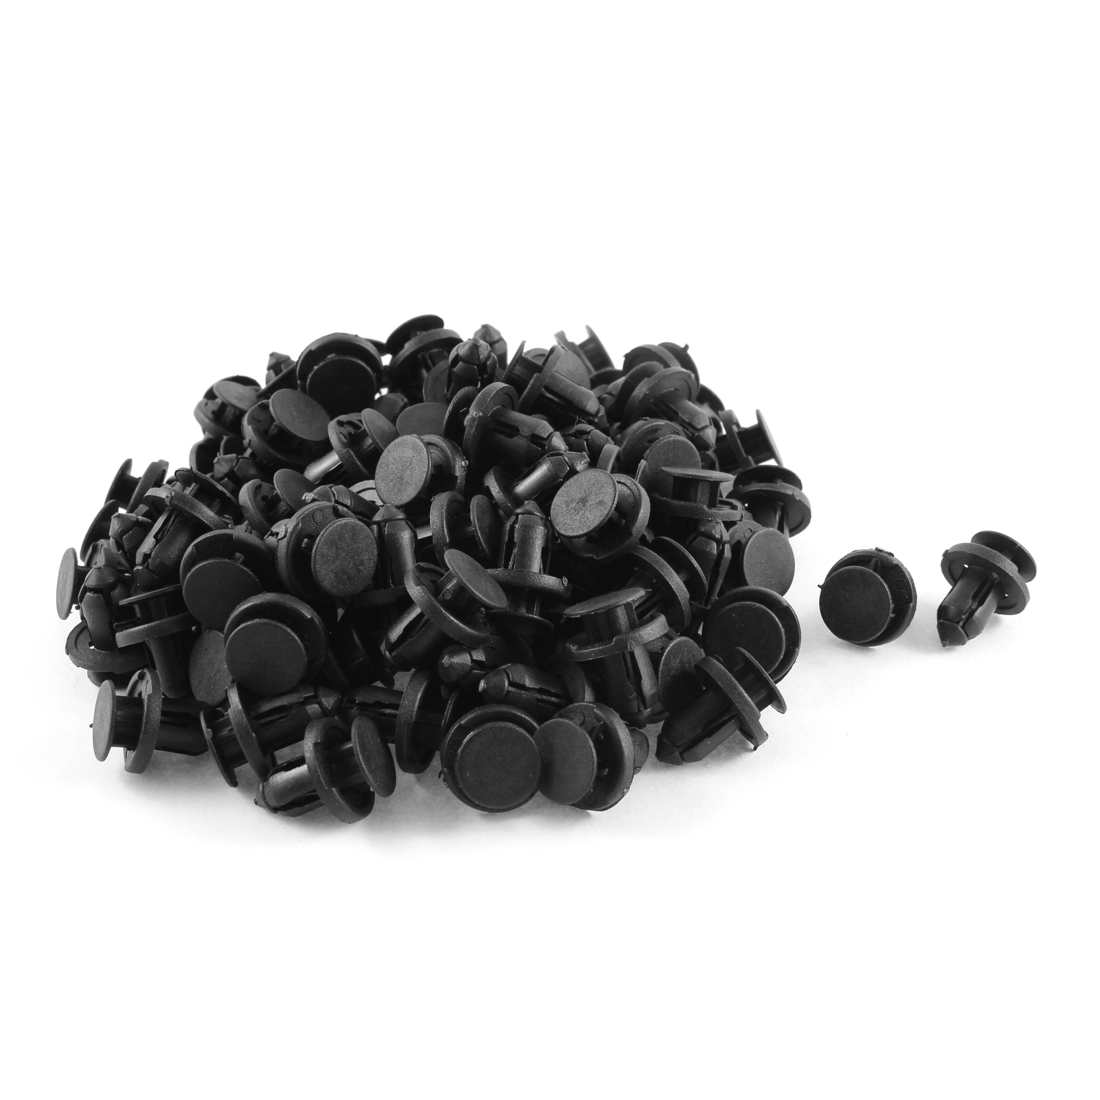 100 Pcs Black Plastic Rivets Fastener Fender Bumper Push Screw Pin Clips 8mm Hole